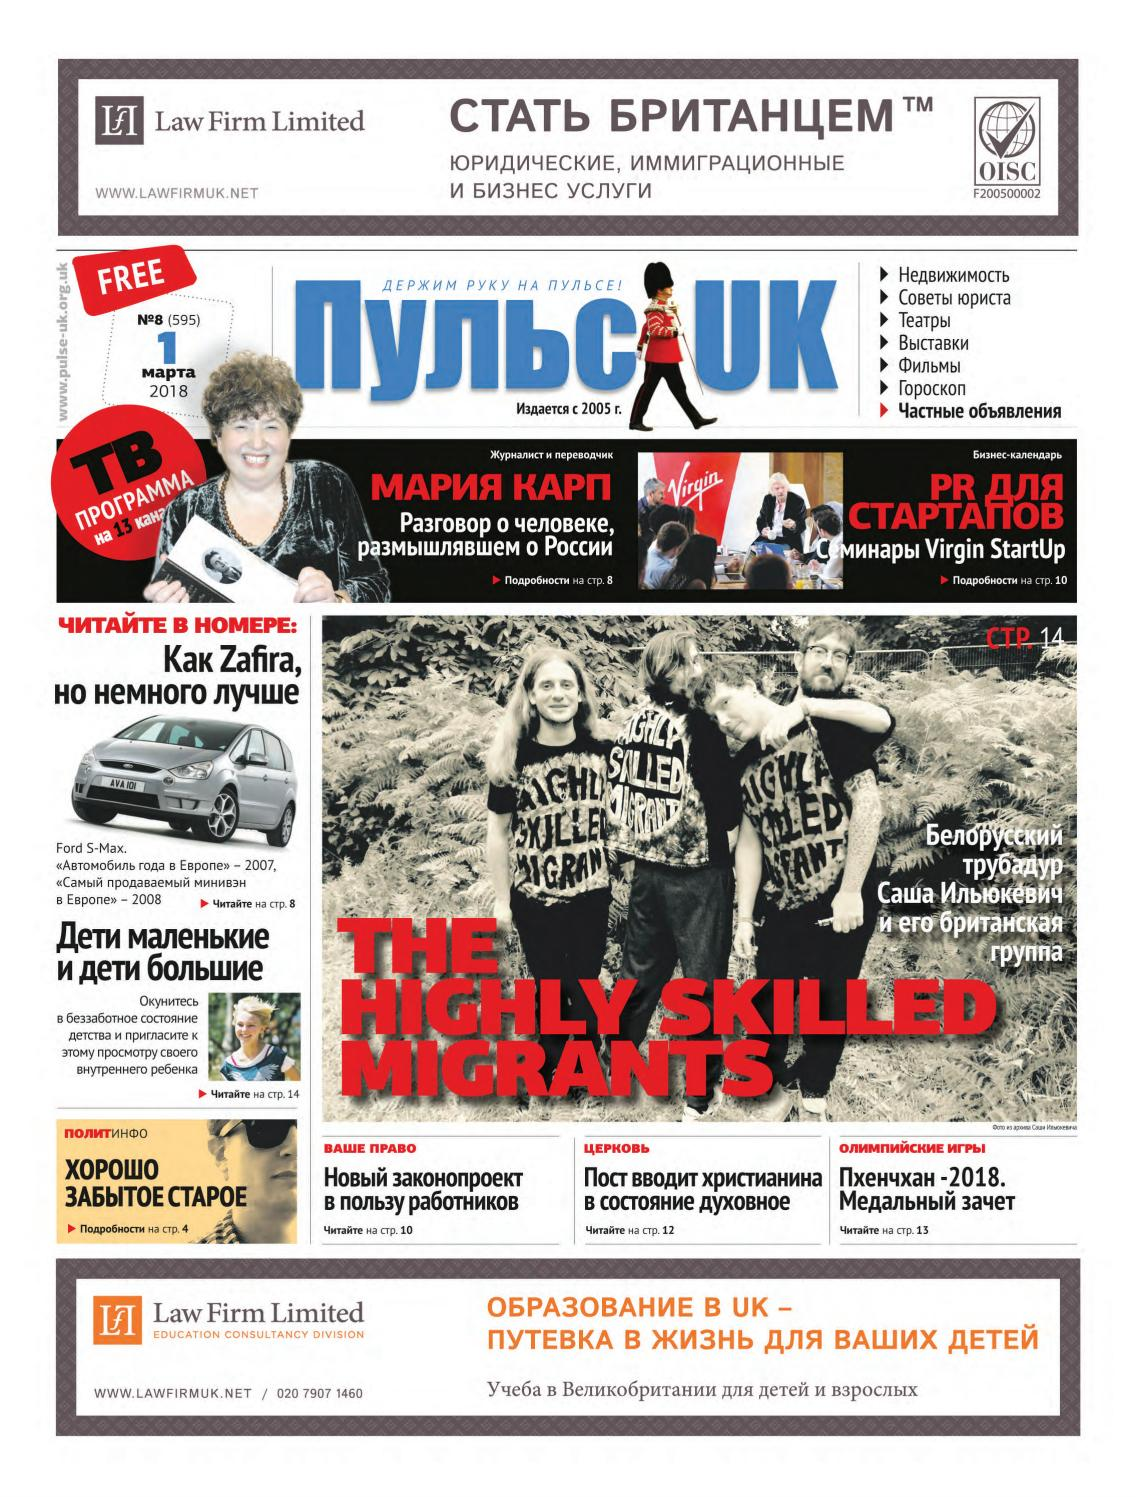 Манчестер юнайтед вест бромвич 11 марта